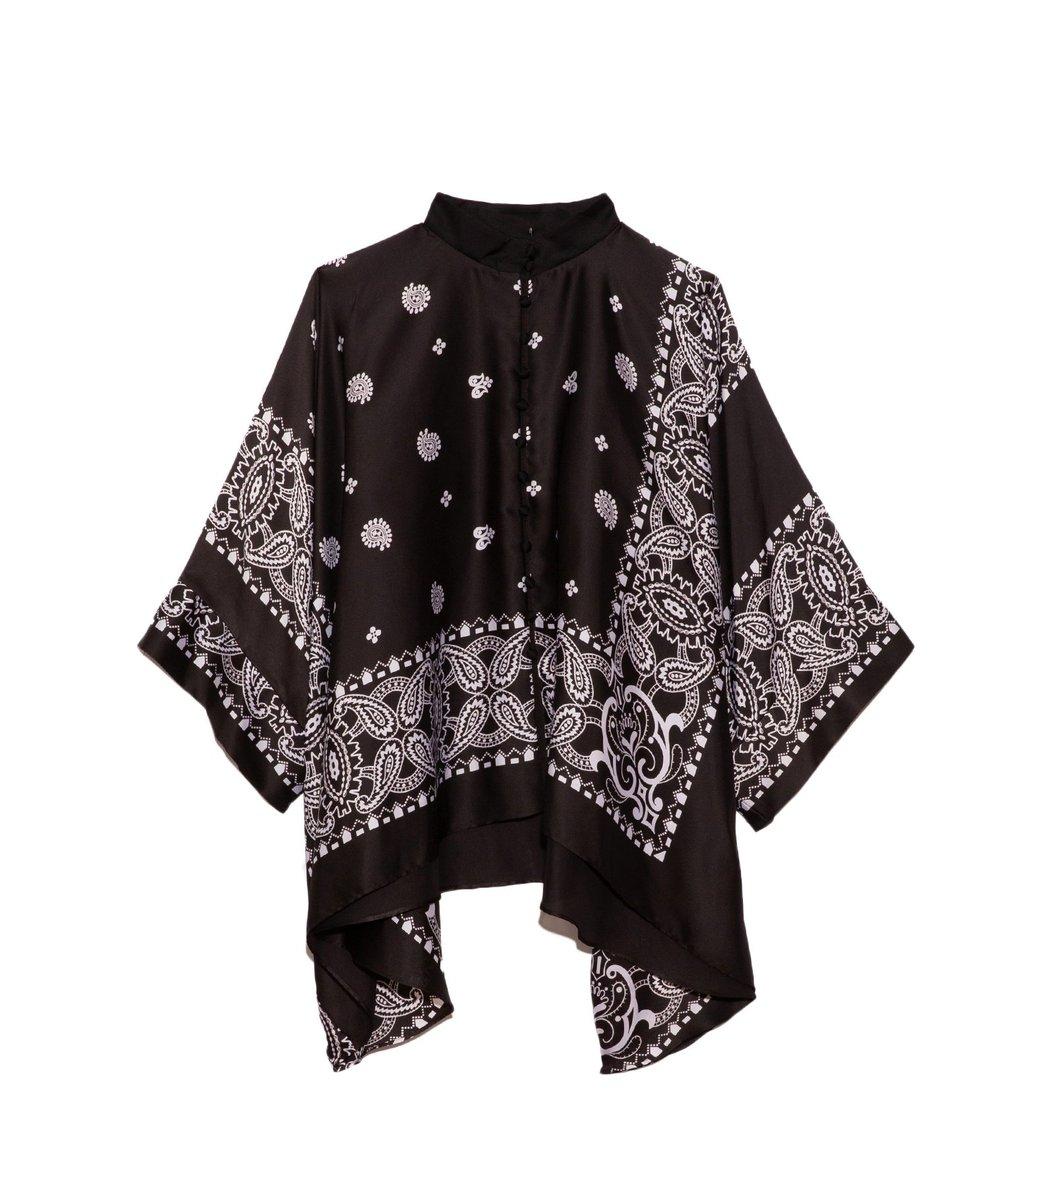 Sacai Archive Print Mix Shirt in Black